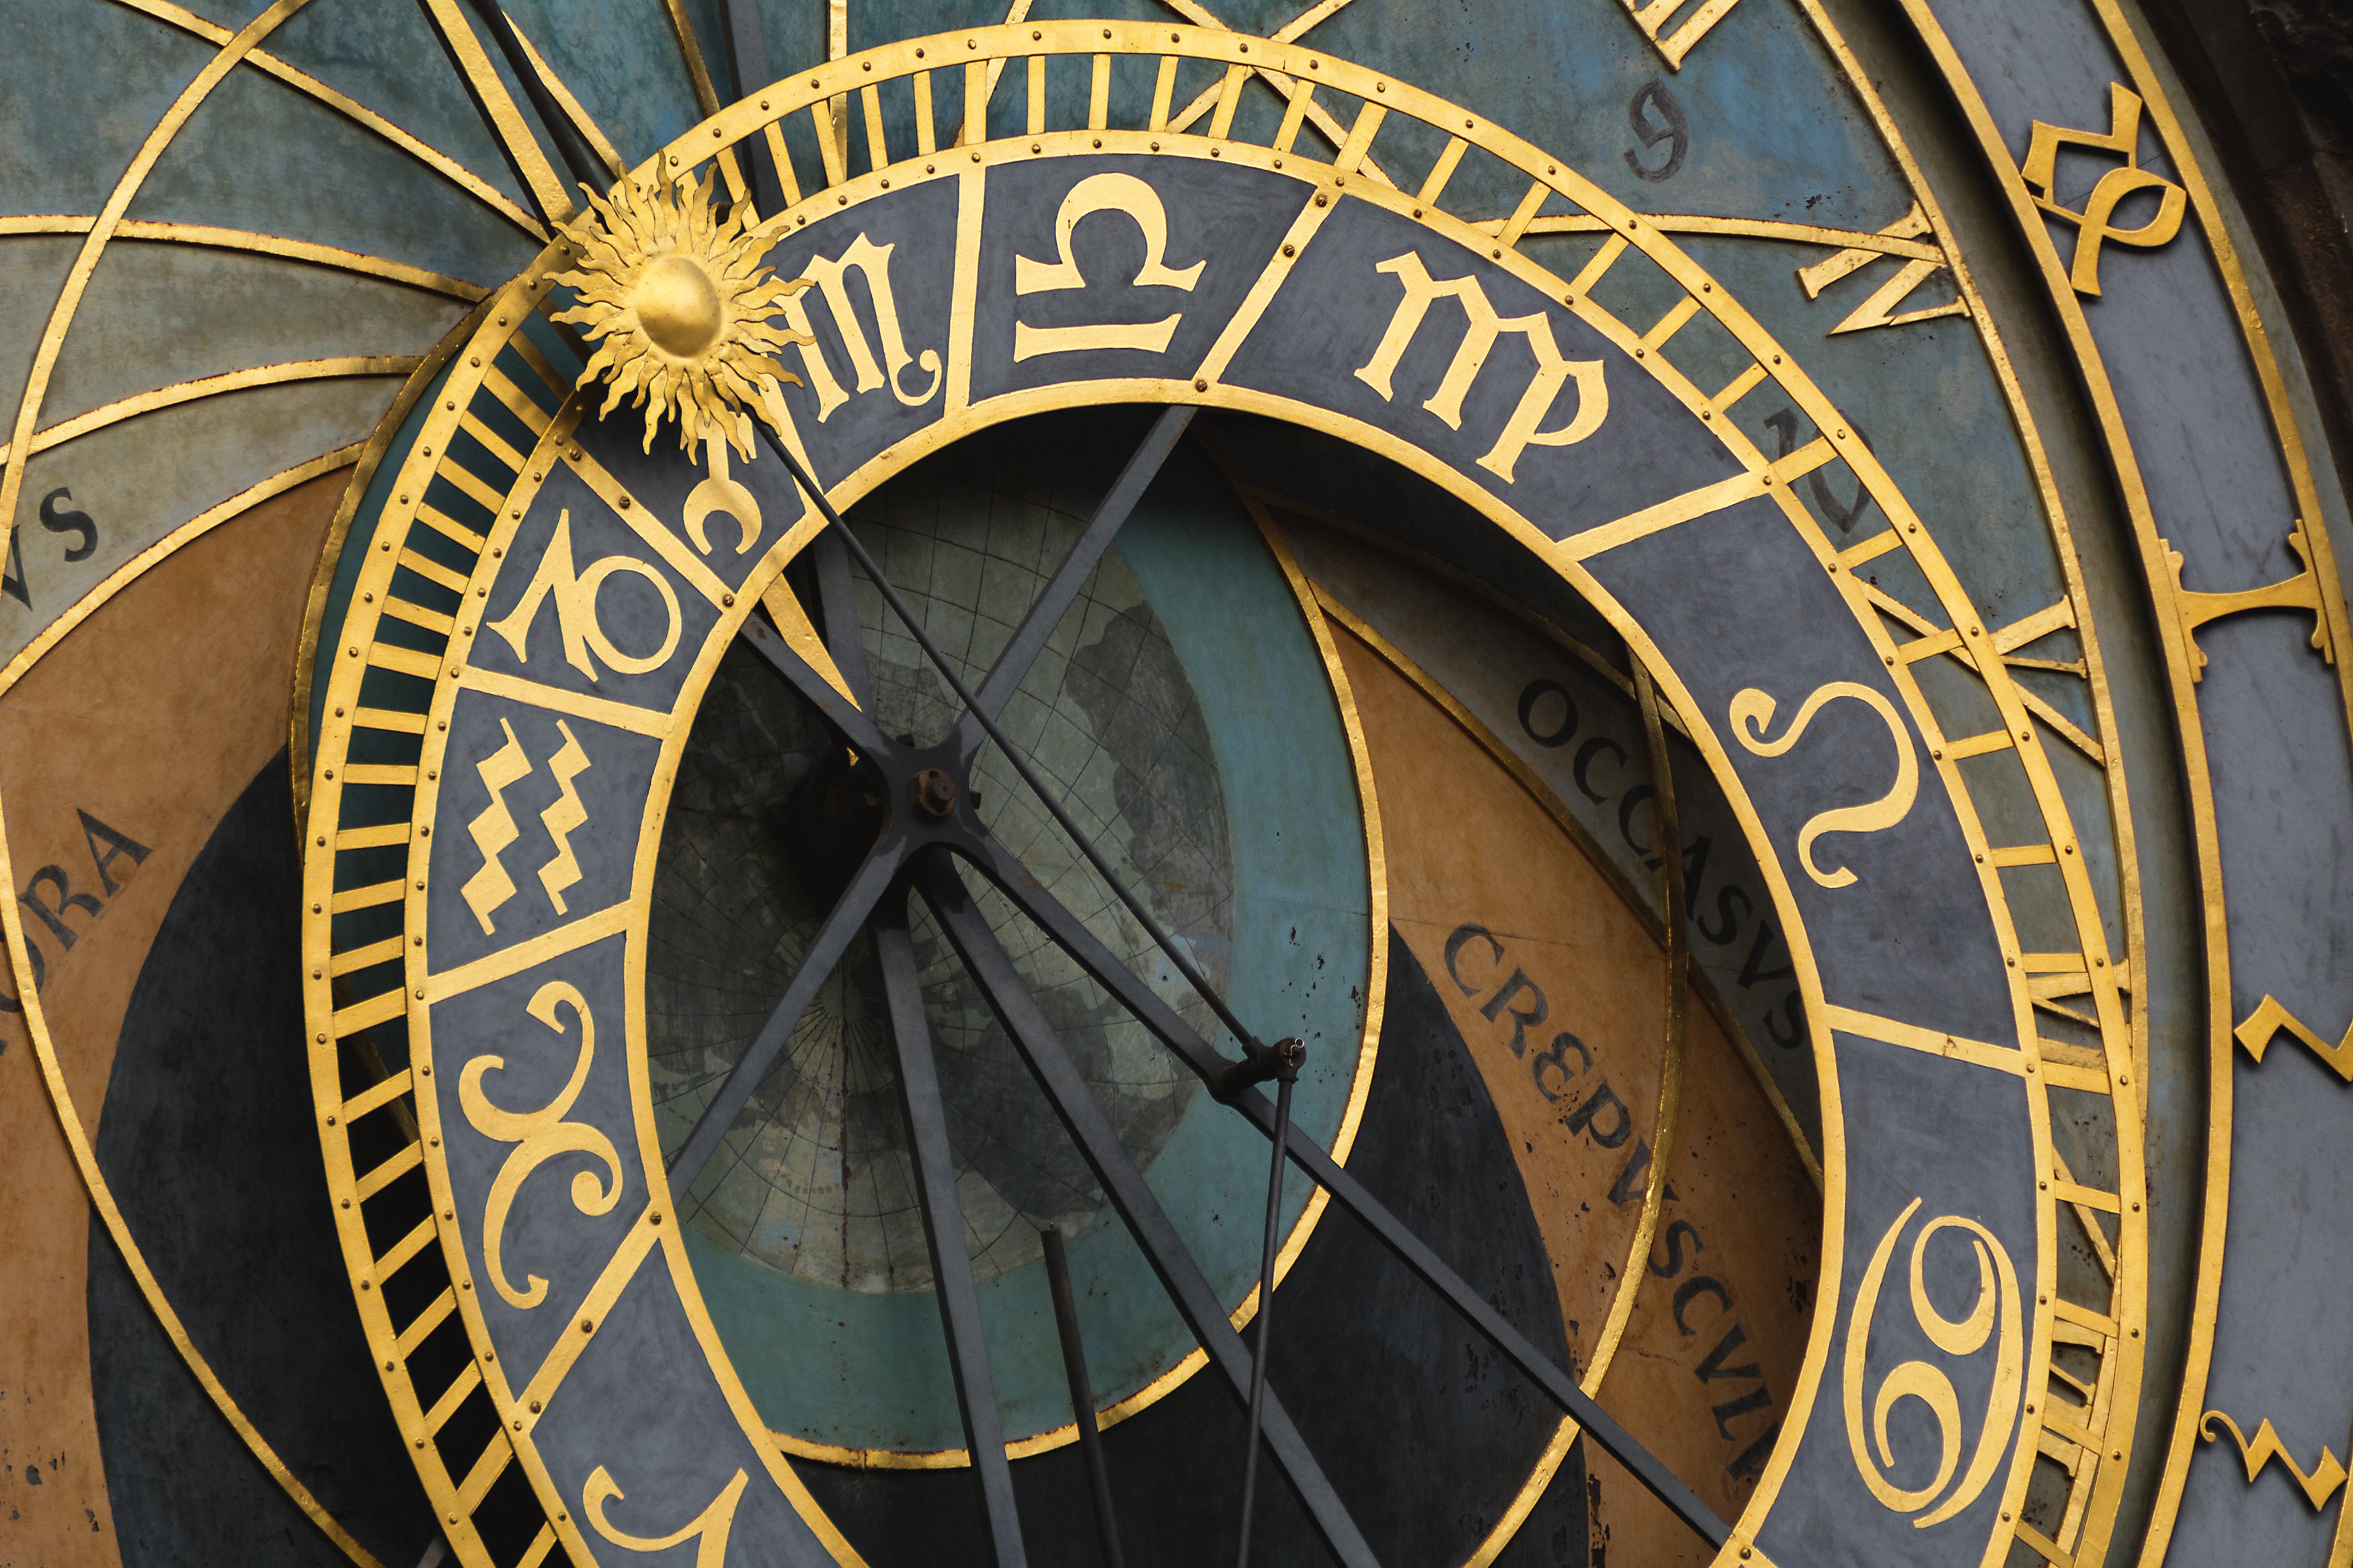 FREE IMAGE: Prague astronomical clock close up - Libreshot Public Domain Photos